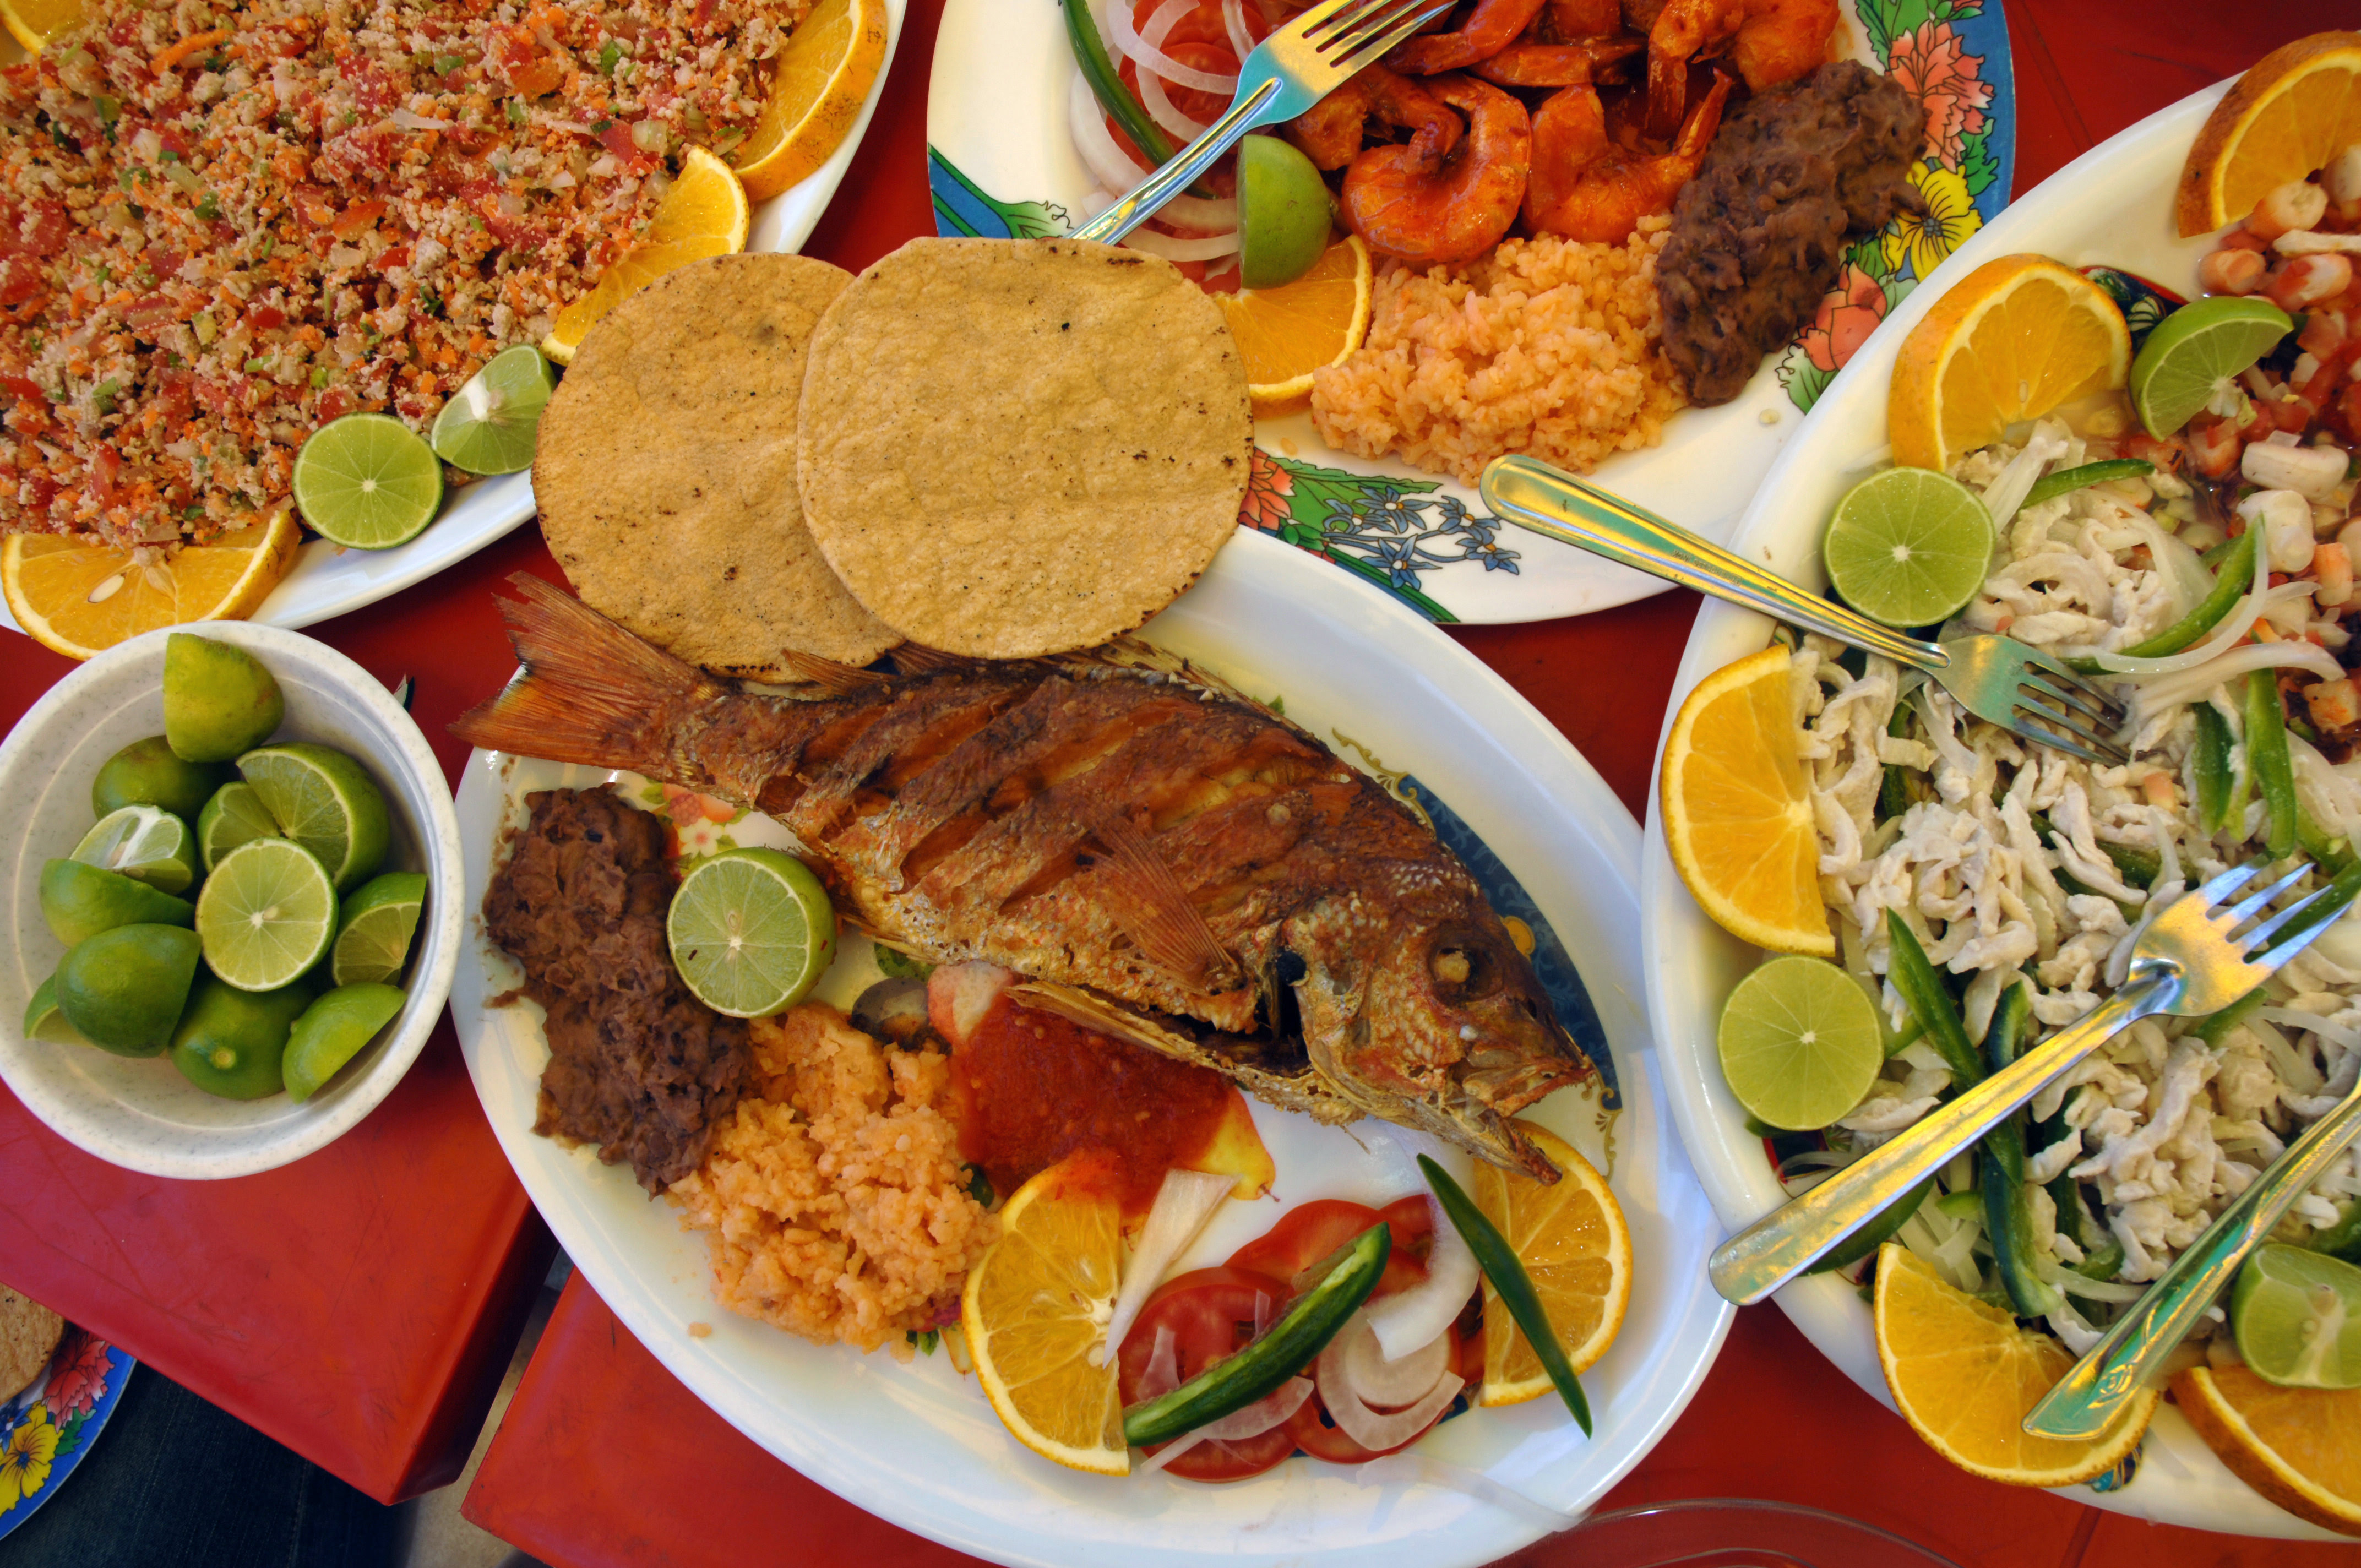 La gastronomía michoacana, patrimonio ancestral